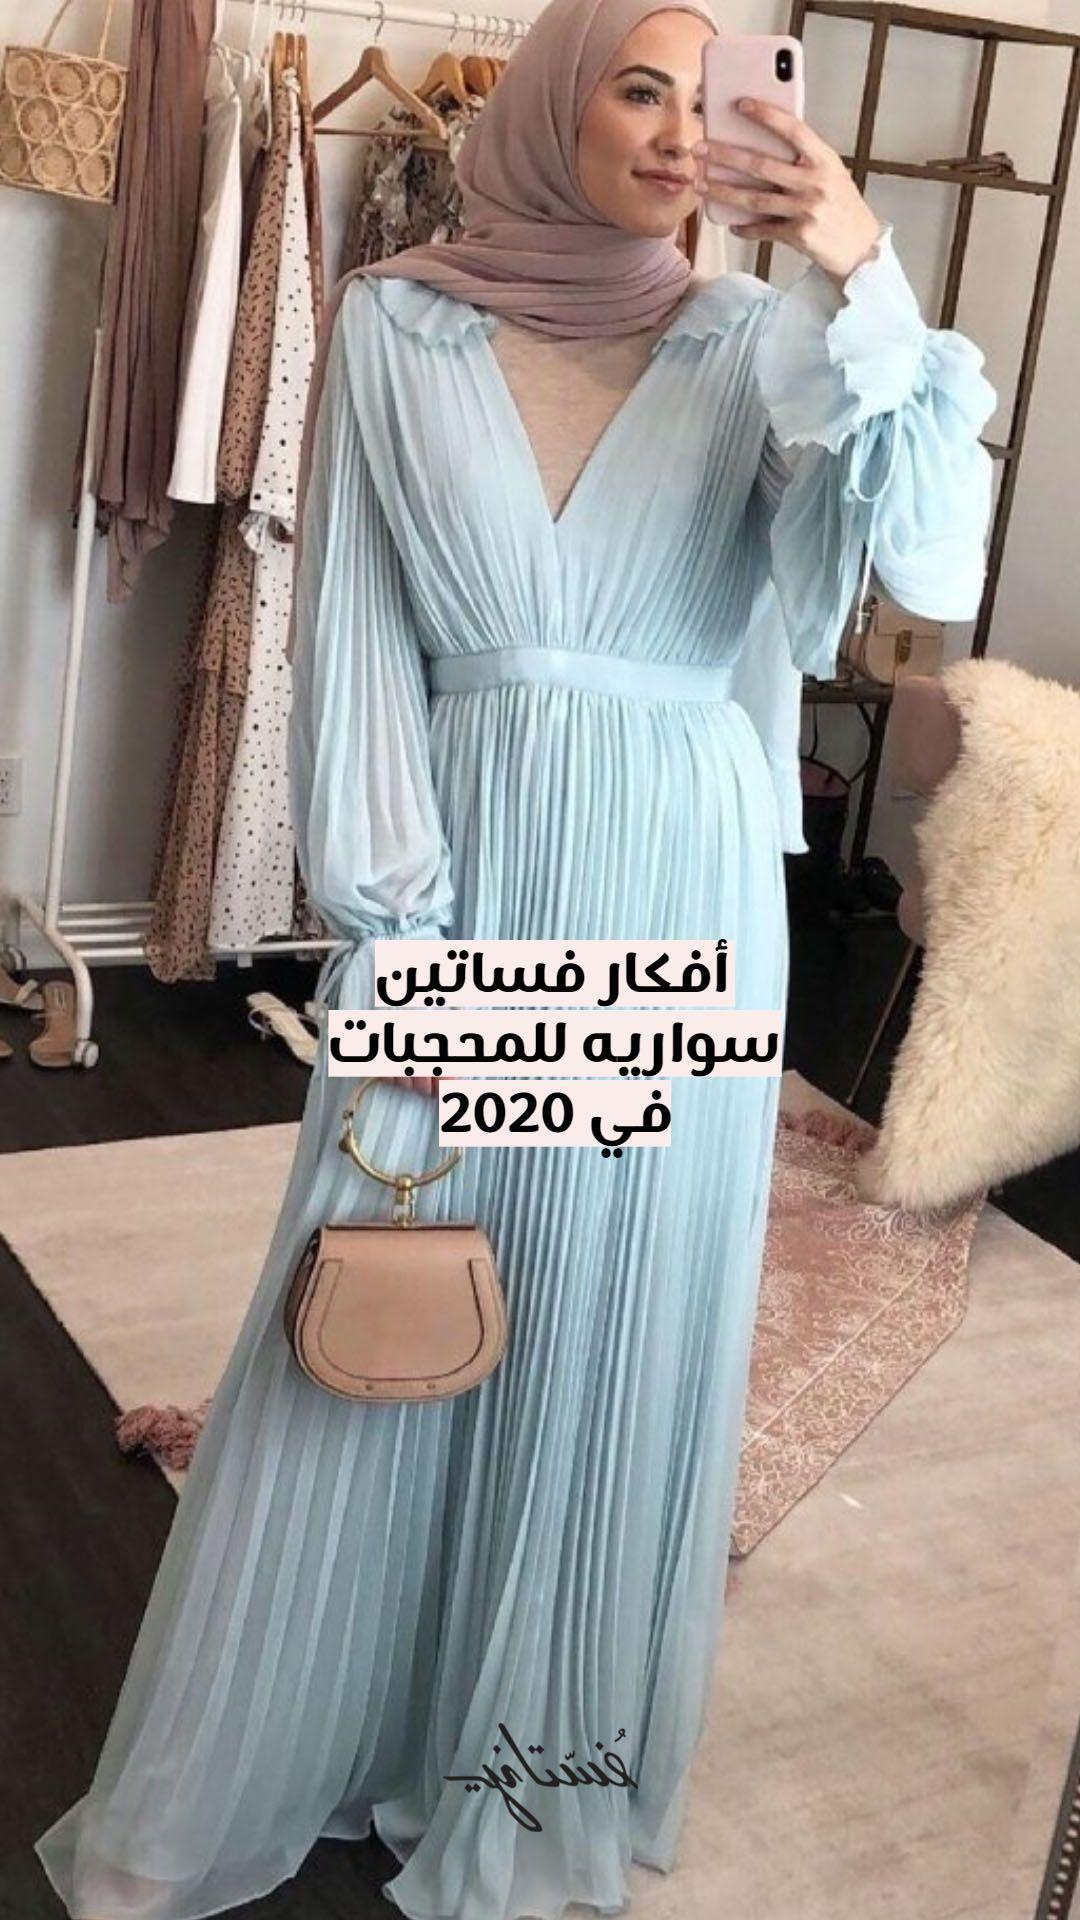 أجمل فساتين سواريه محجبات 2020 وطرق تنسيقها مع مدوني الموضة Formal Dresses Long Fashion Prom Dresses